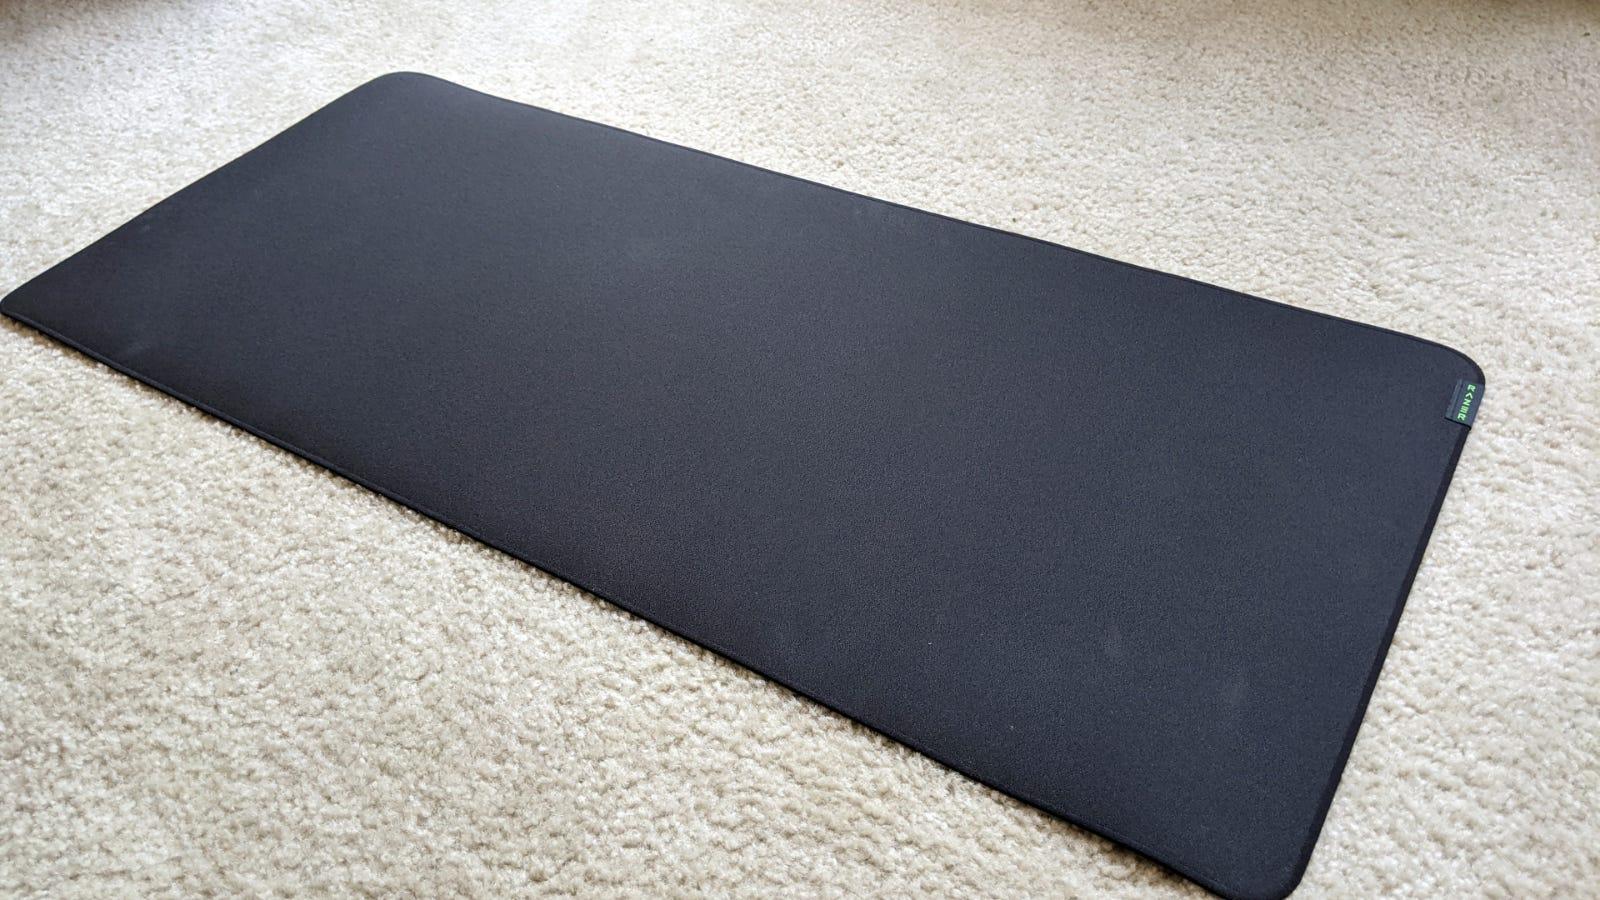 Razer Strider XXL mousepad on carpeted floor